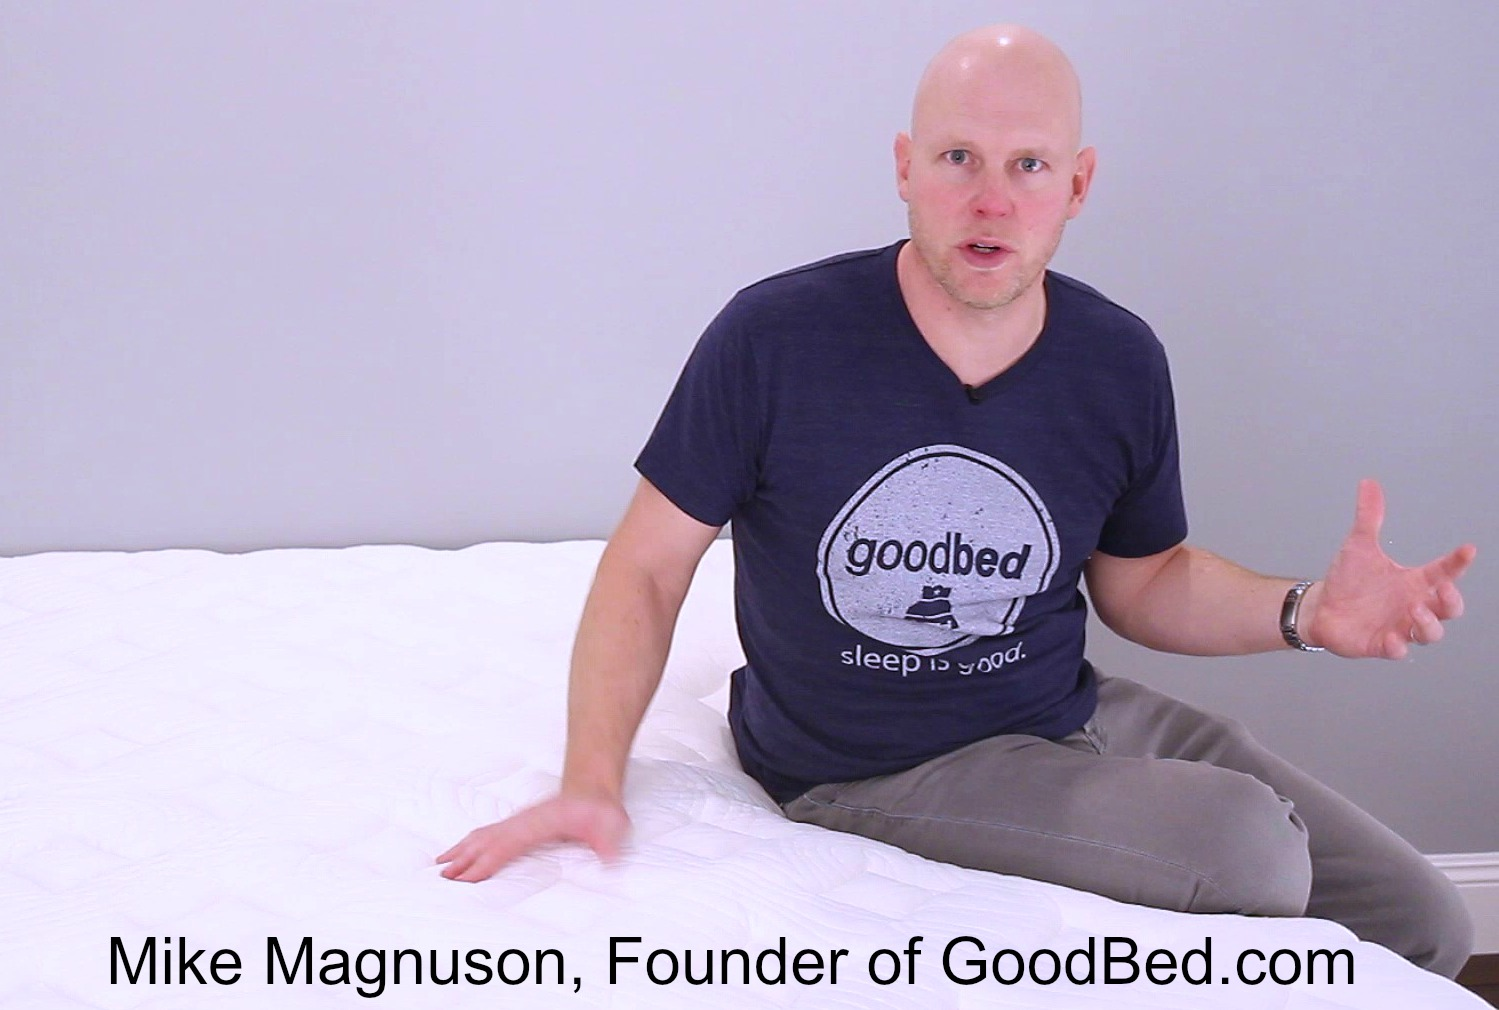 Mike Magnuson